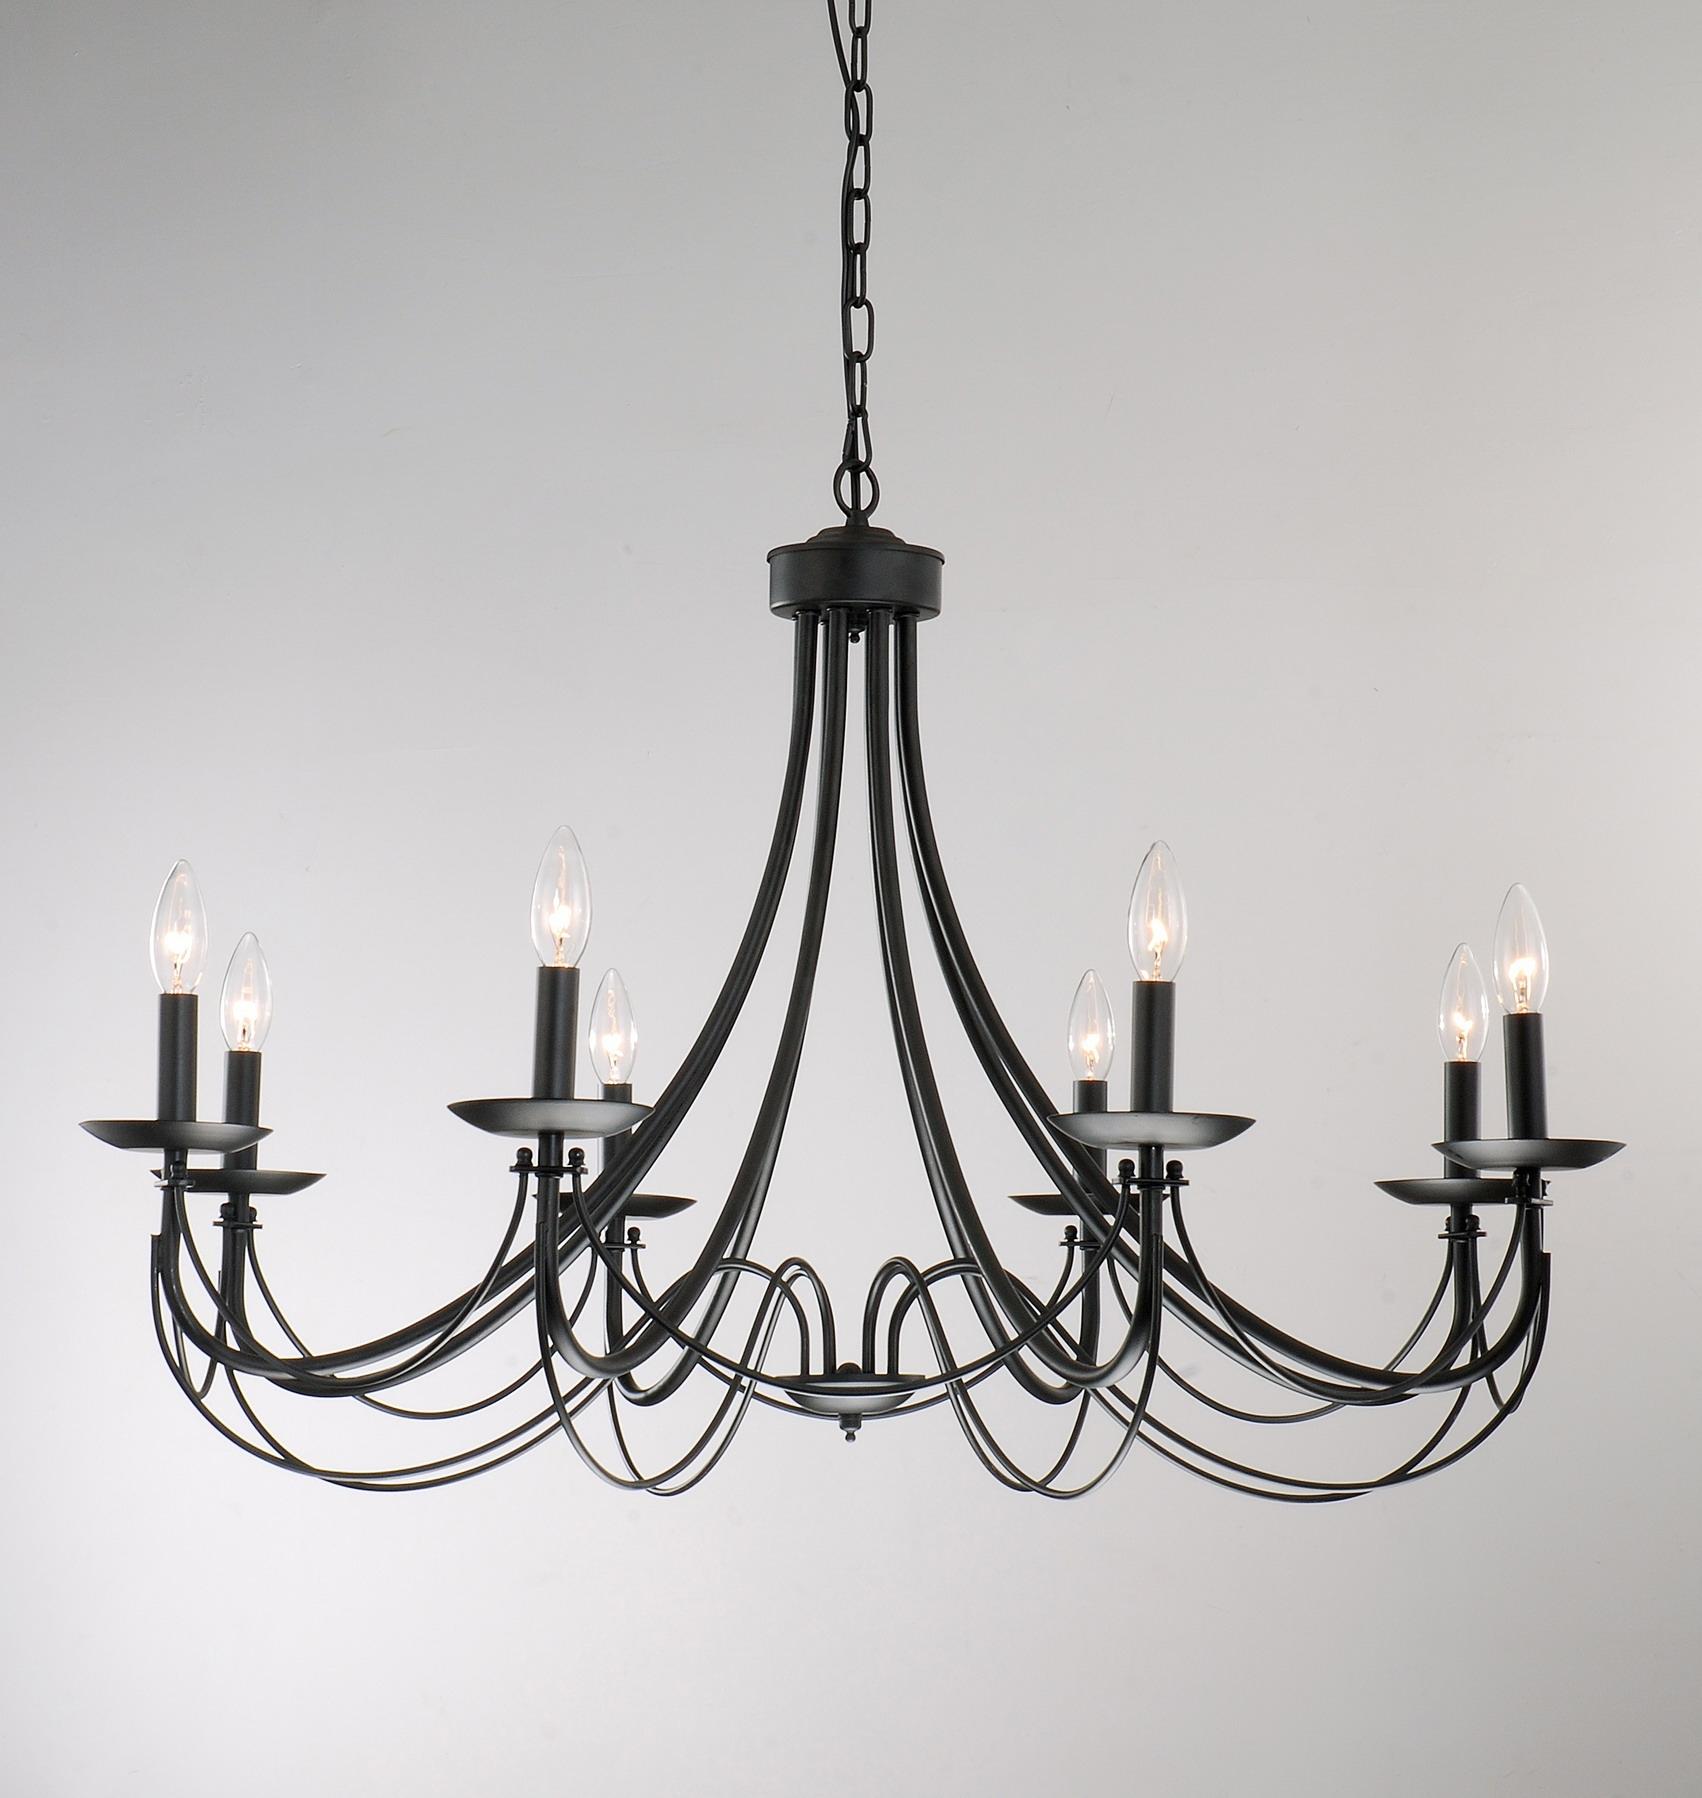 Iron 8 Light Black Chandelier Shopping Entryway And Design Regarding Large Black Chandelier (Image 8 of 15)